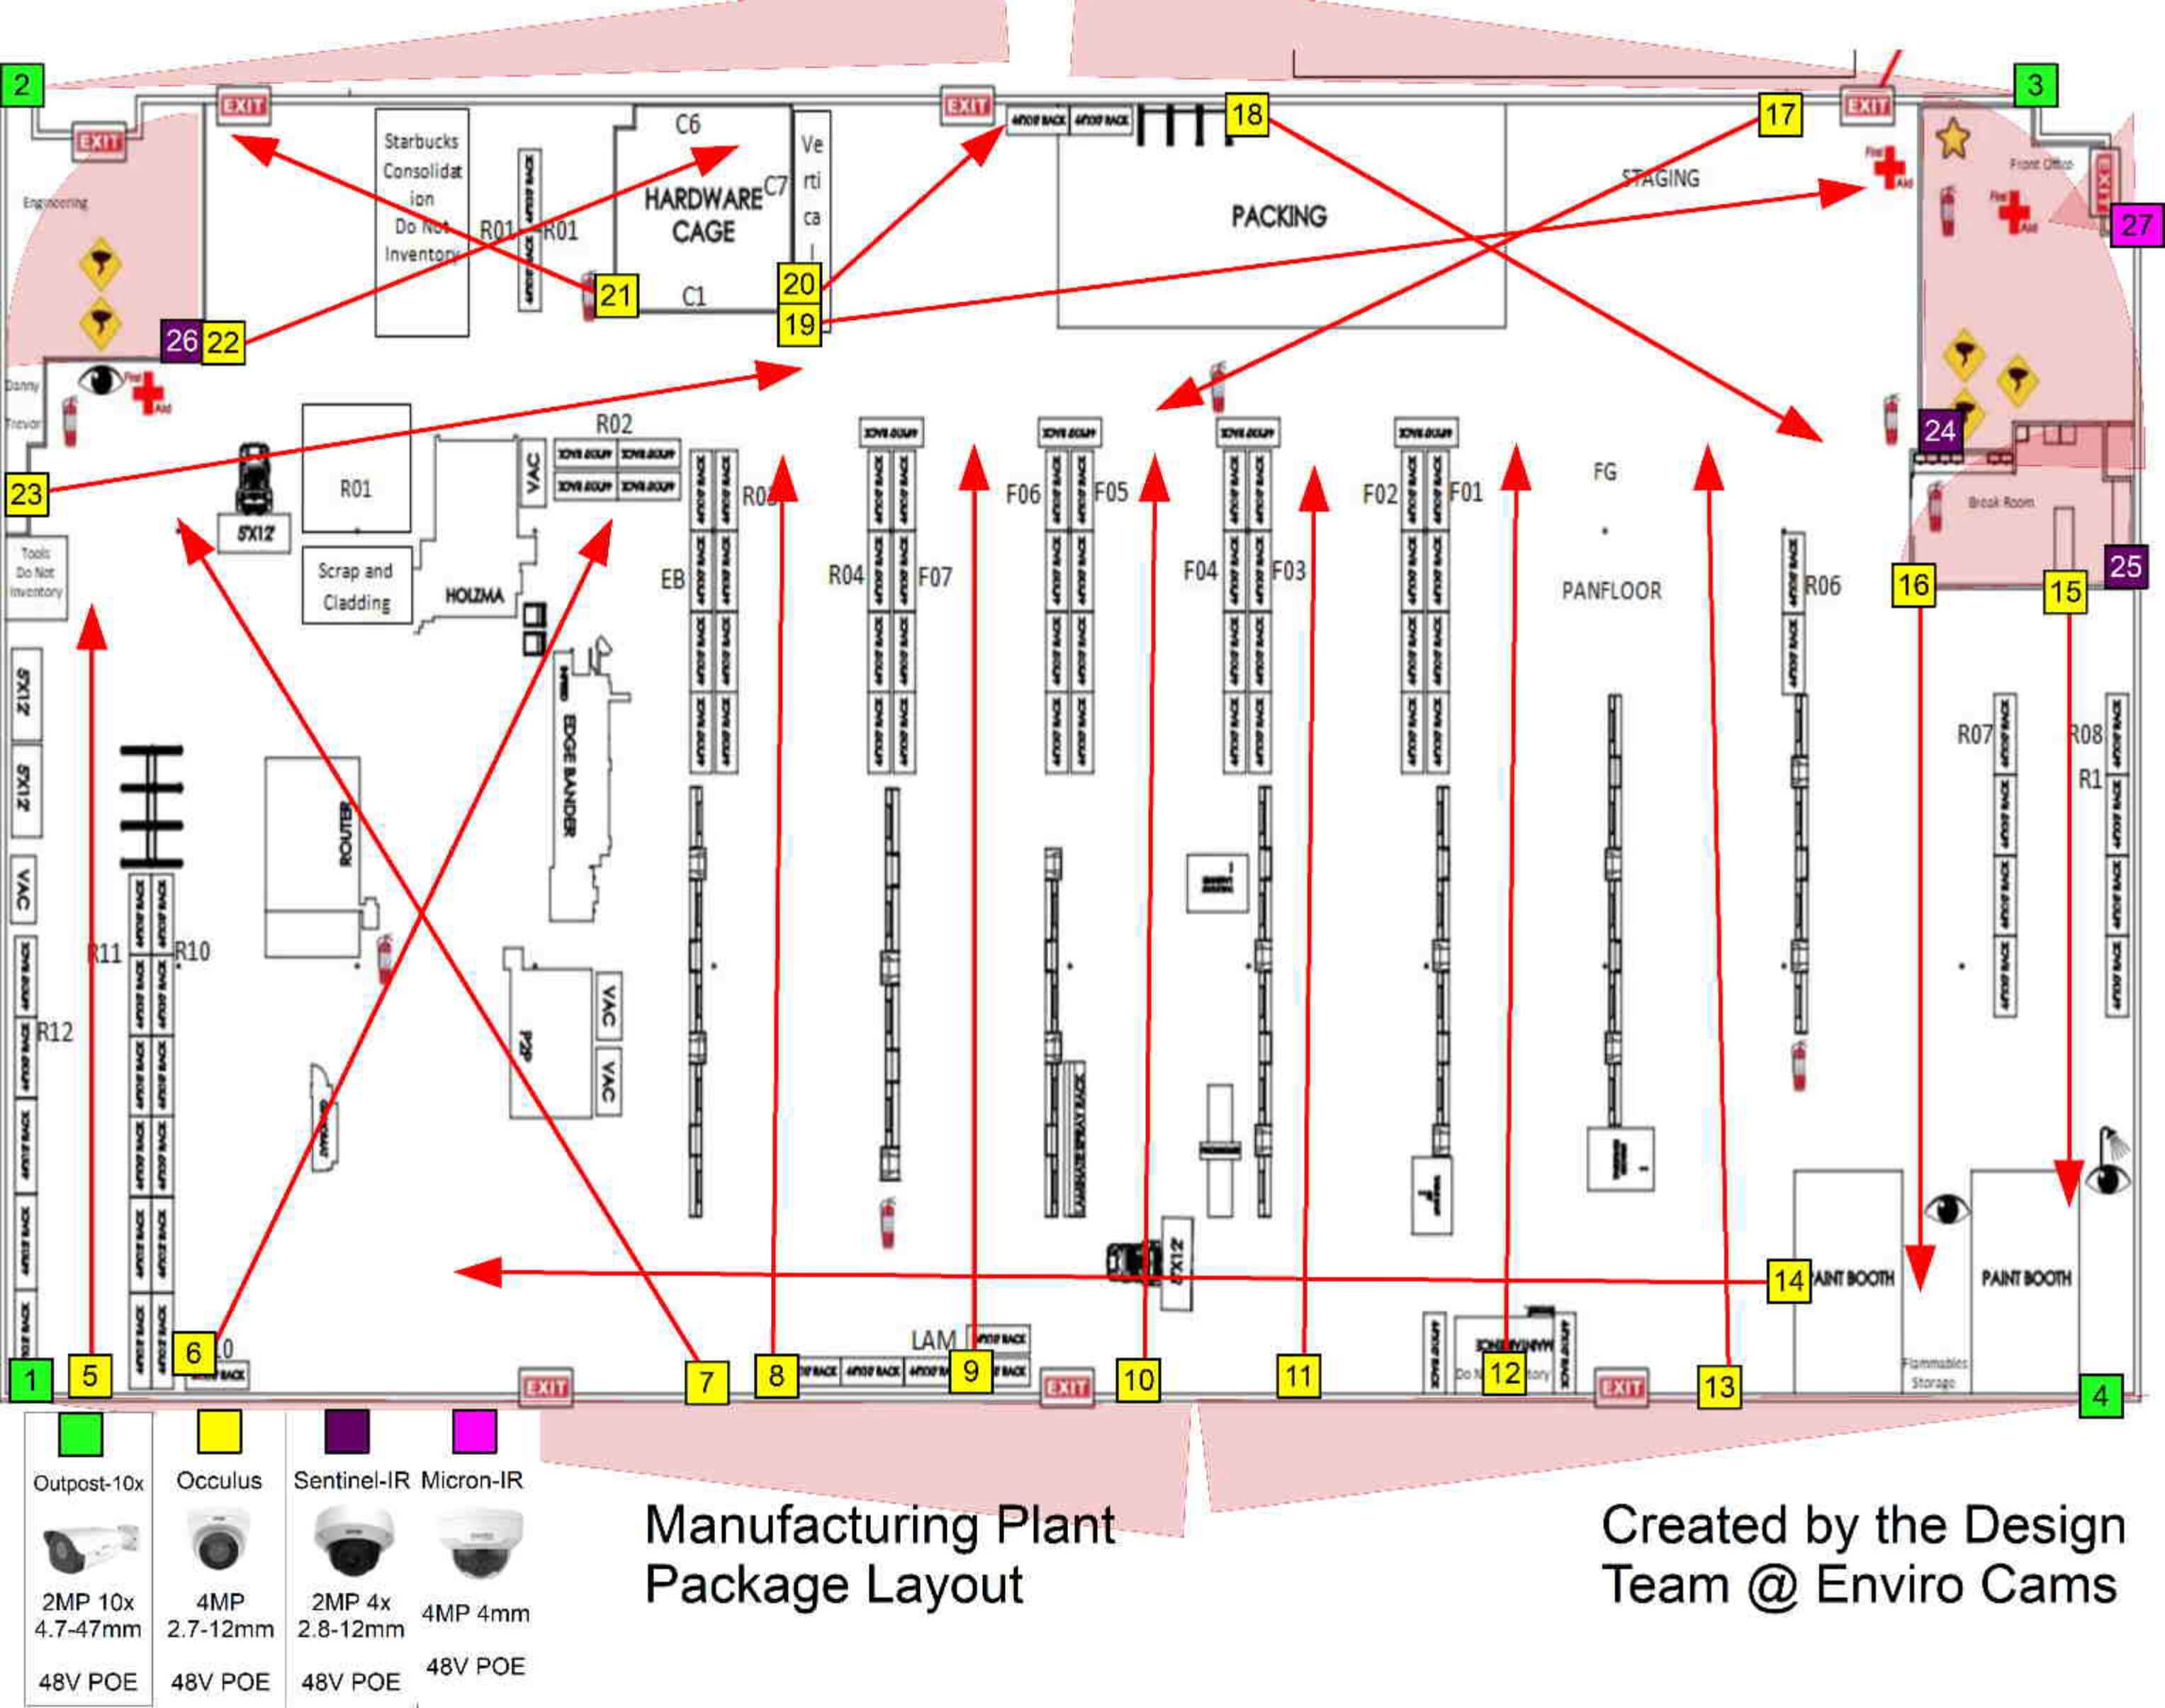 ManufacturingPlant - Cameras Reduce Warehousing & Manufacturing Losses